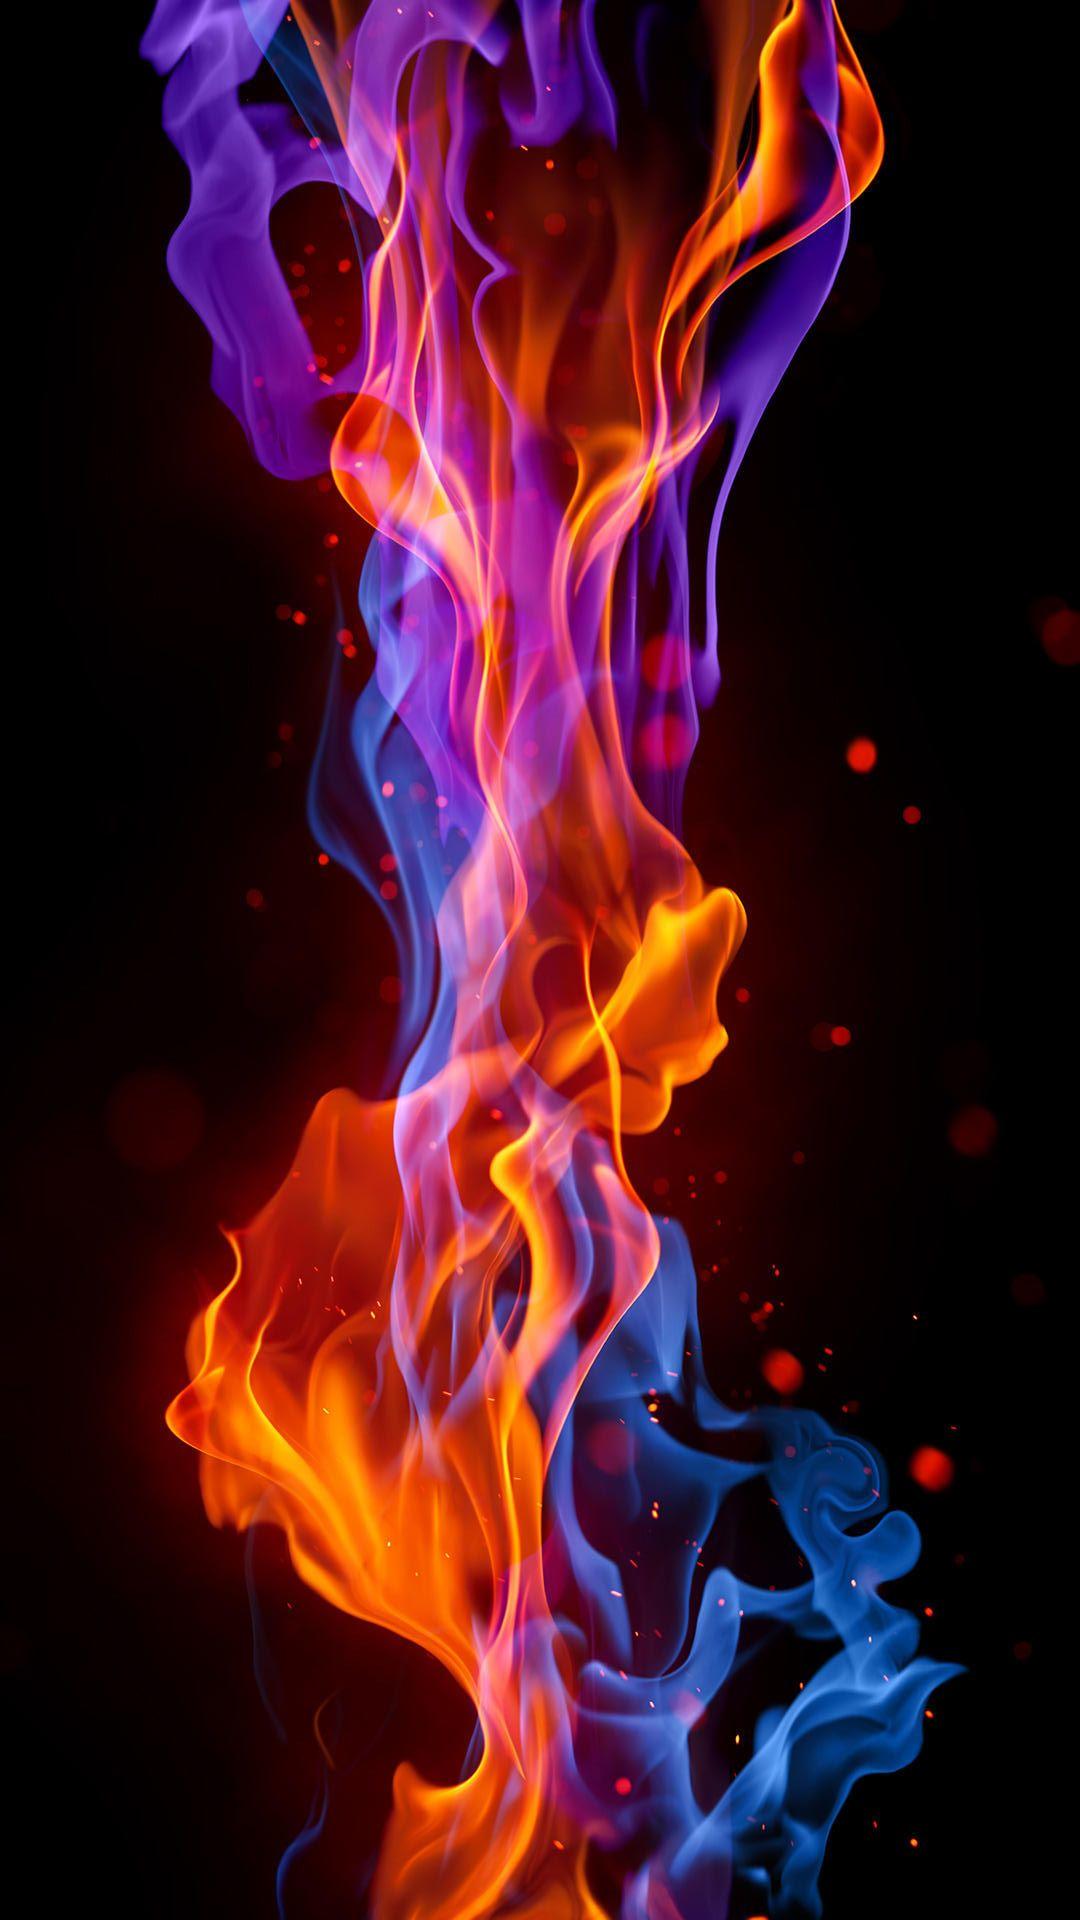 50 Fire Tablet Wallpapers On Wallpapersafari